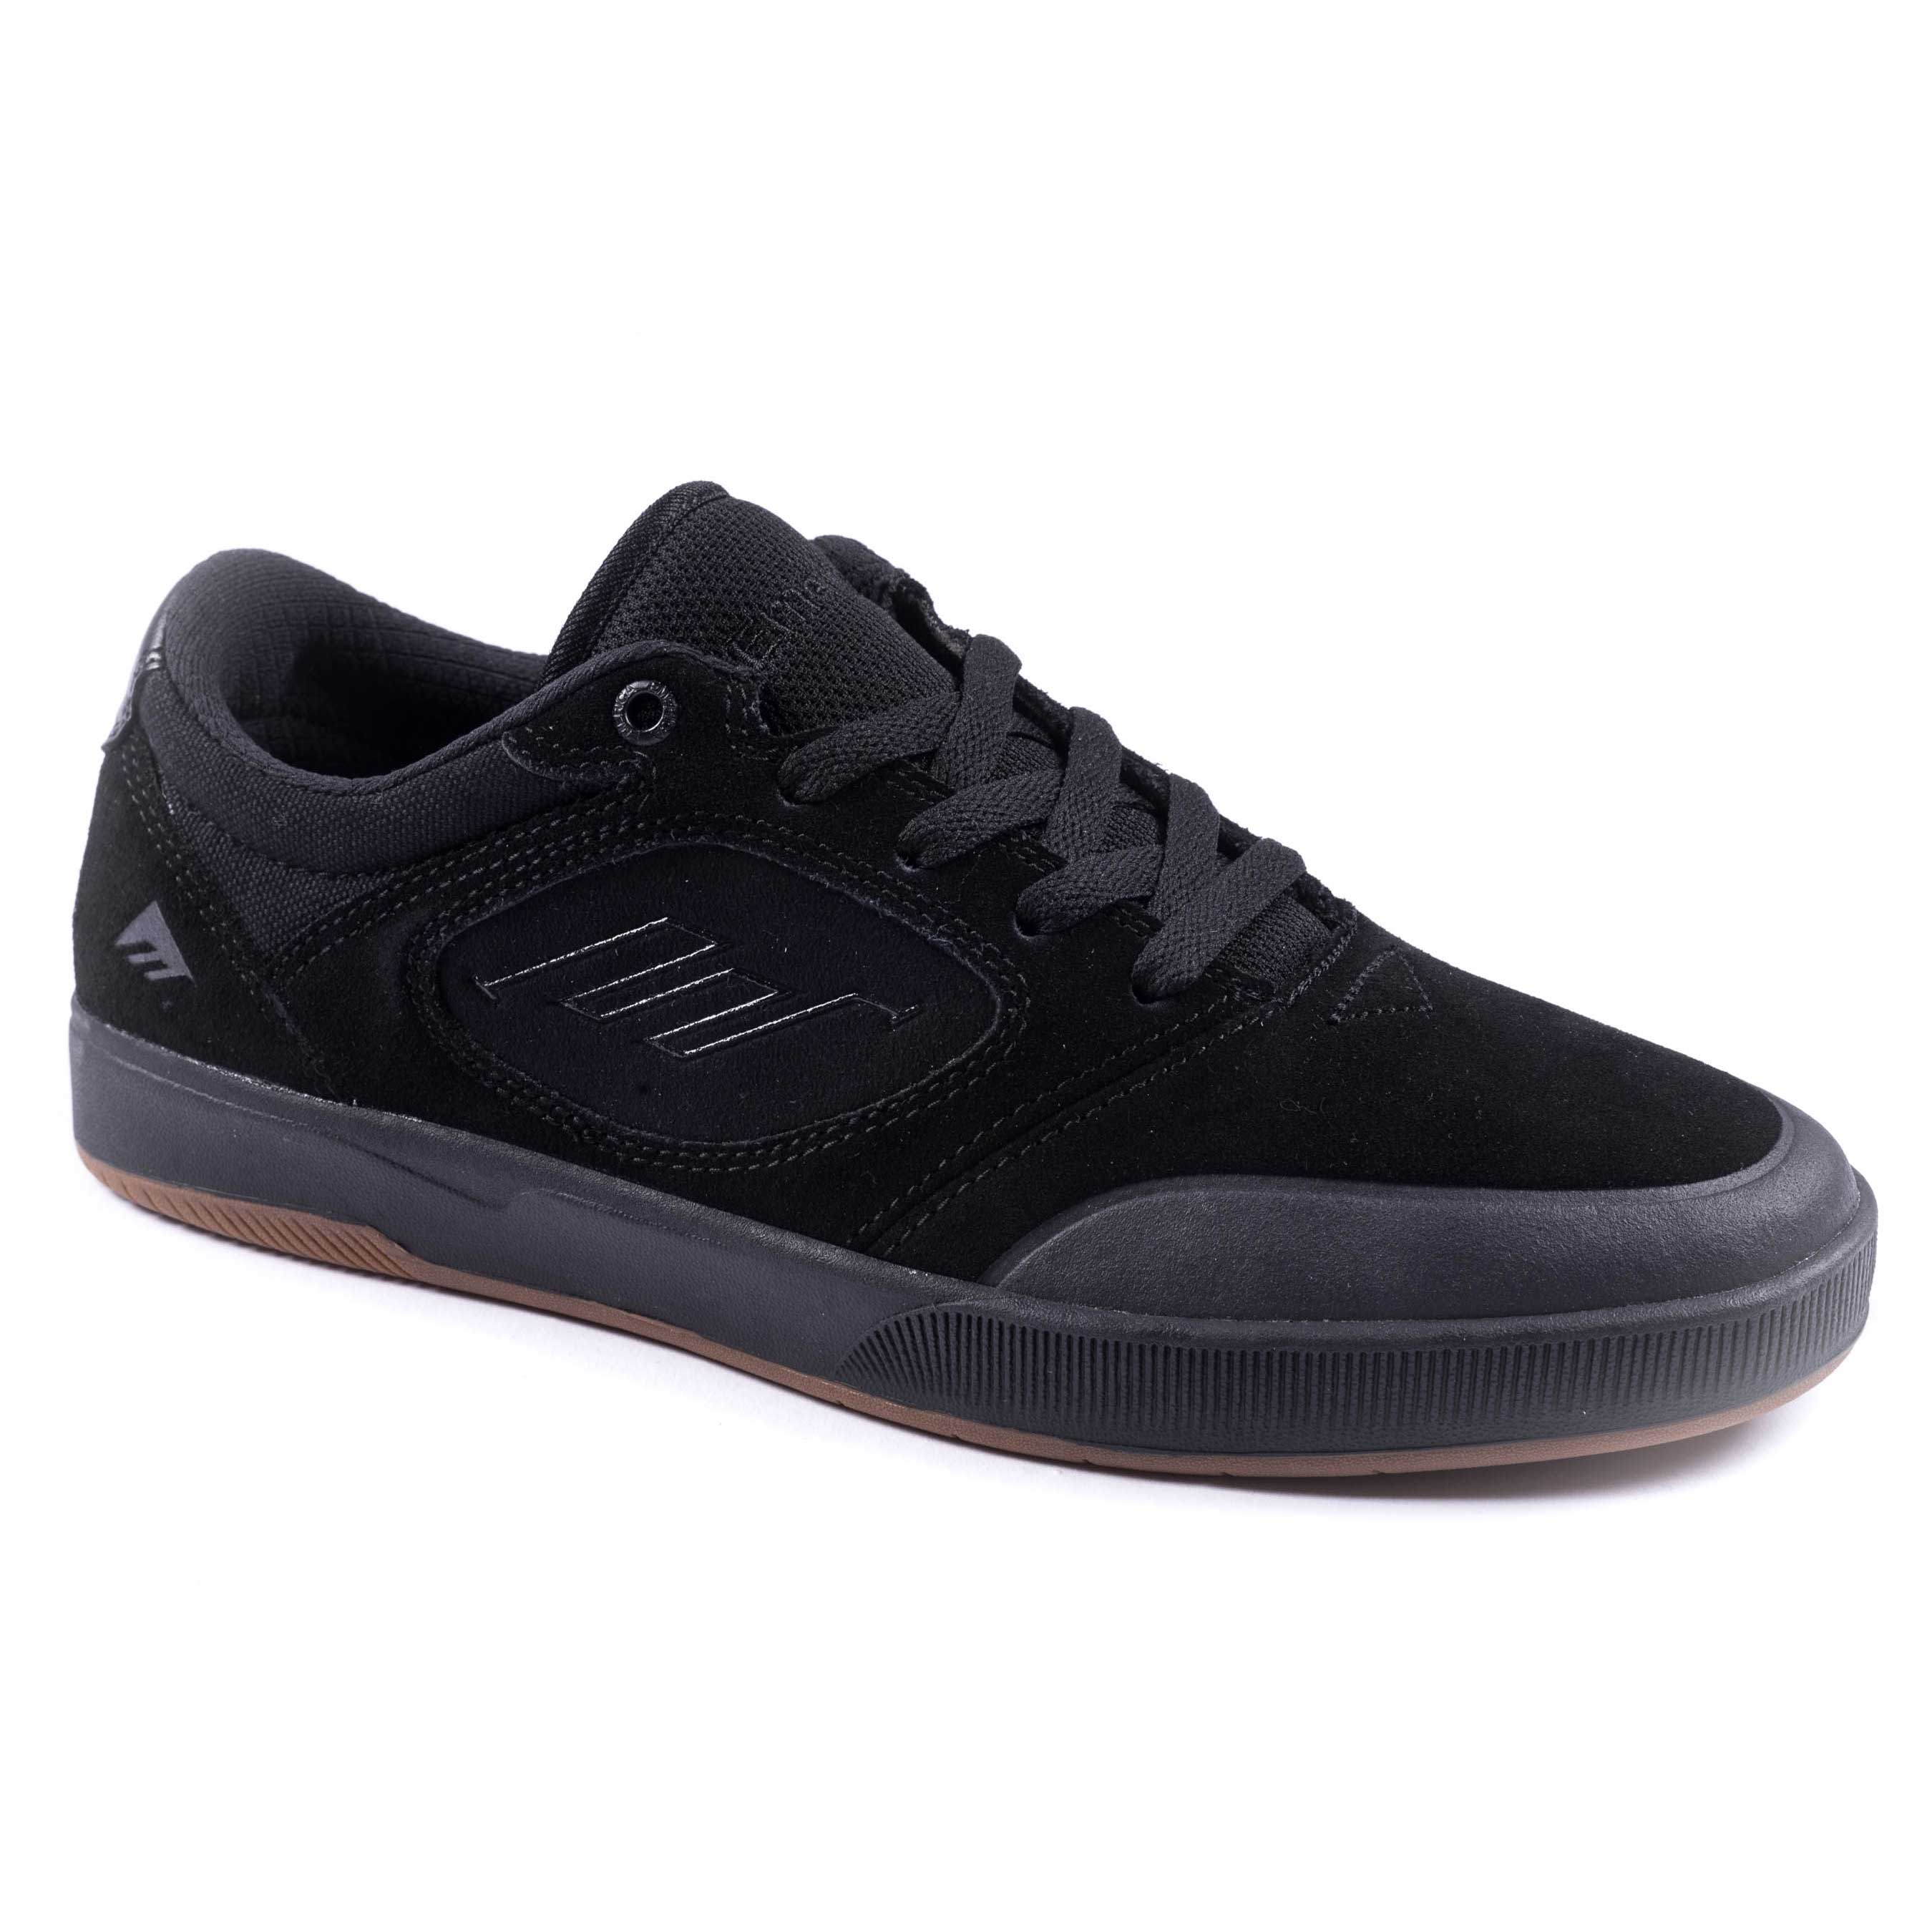 Emerica Shoes Dissent | eBay